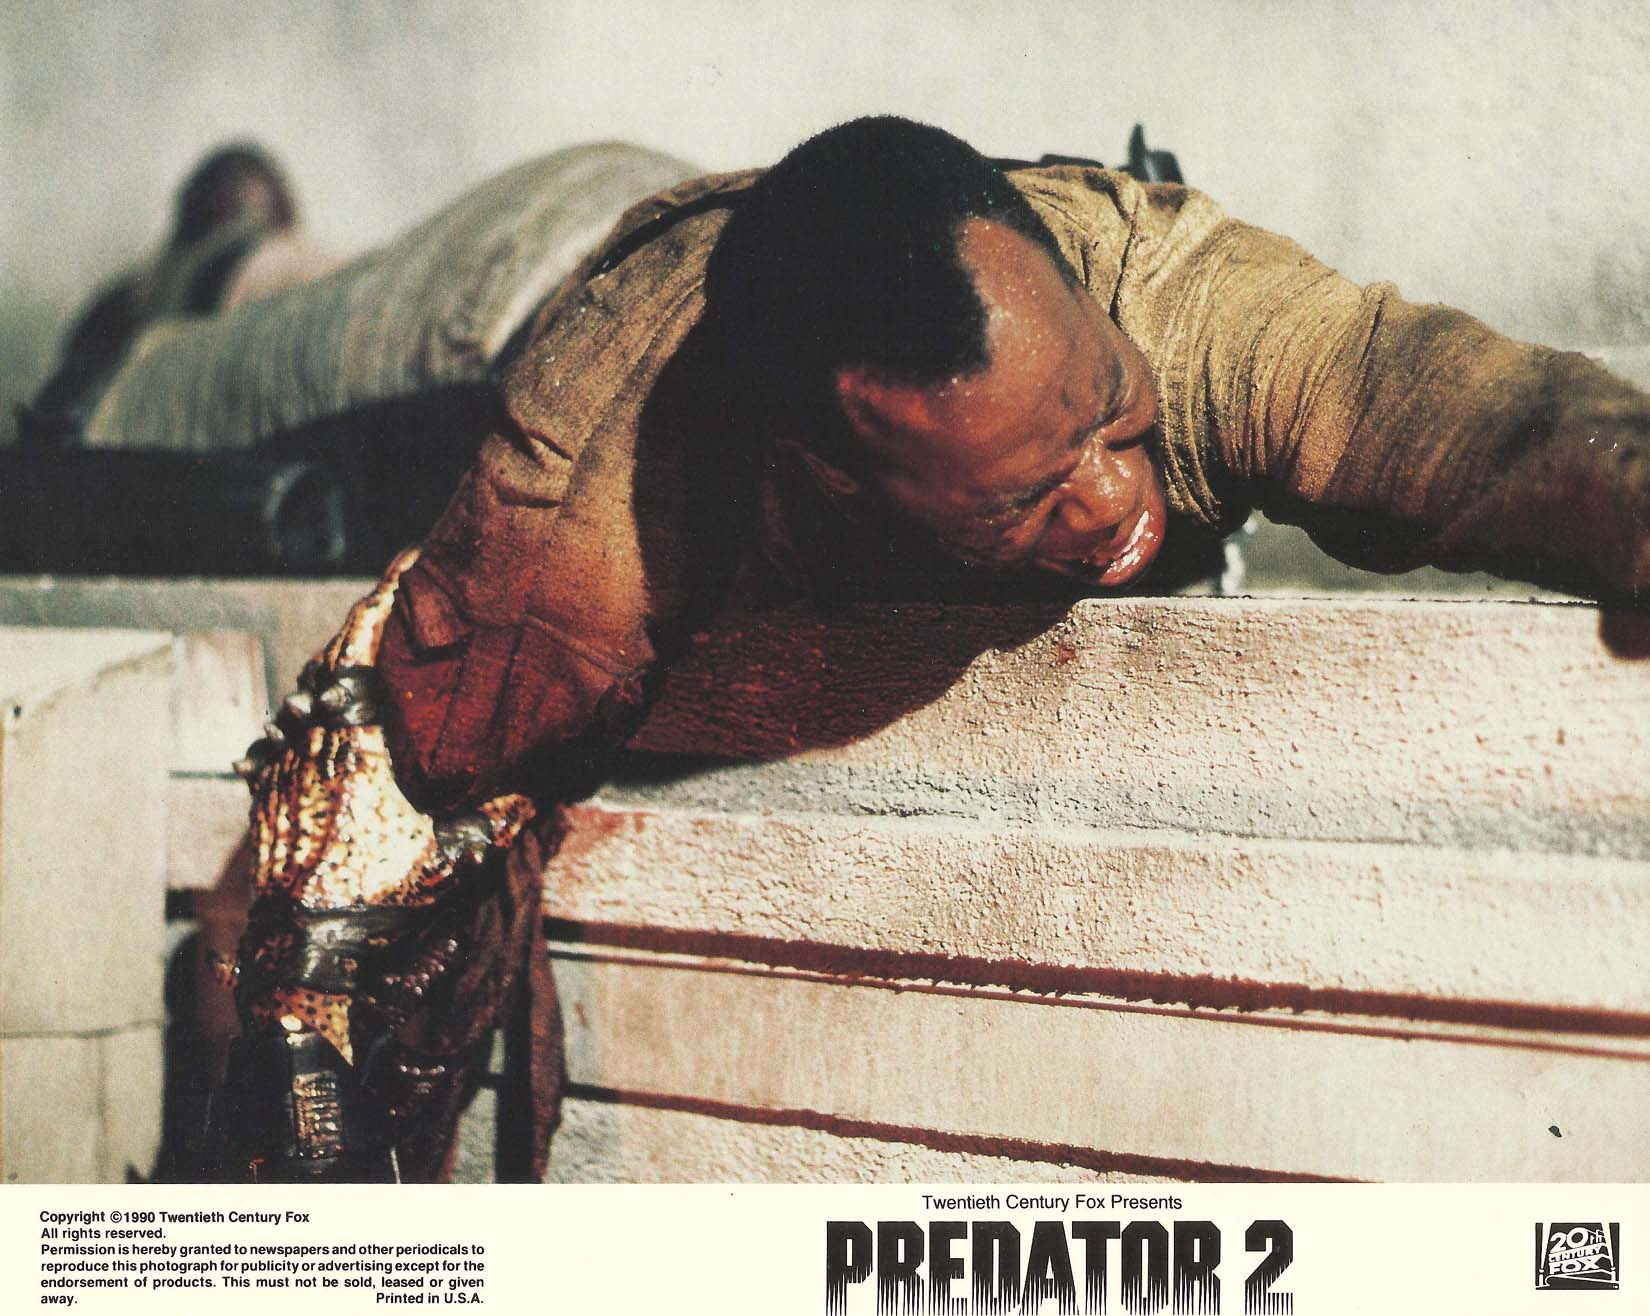 Danny Glover Predator 2 Images - Reverse Search Predator 2 Danny Glover